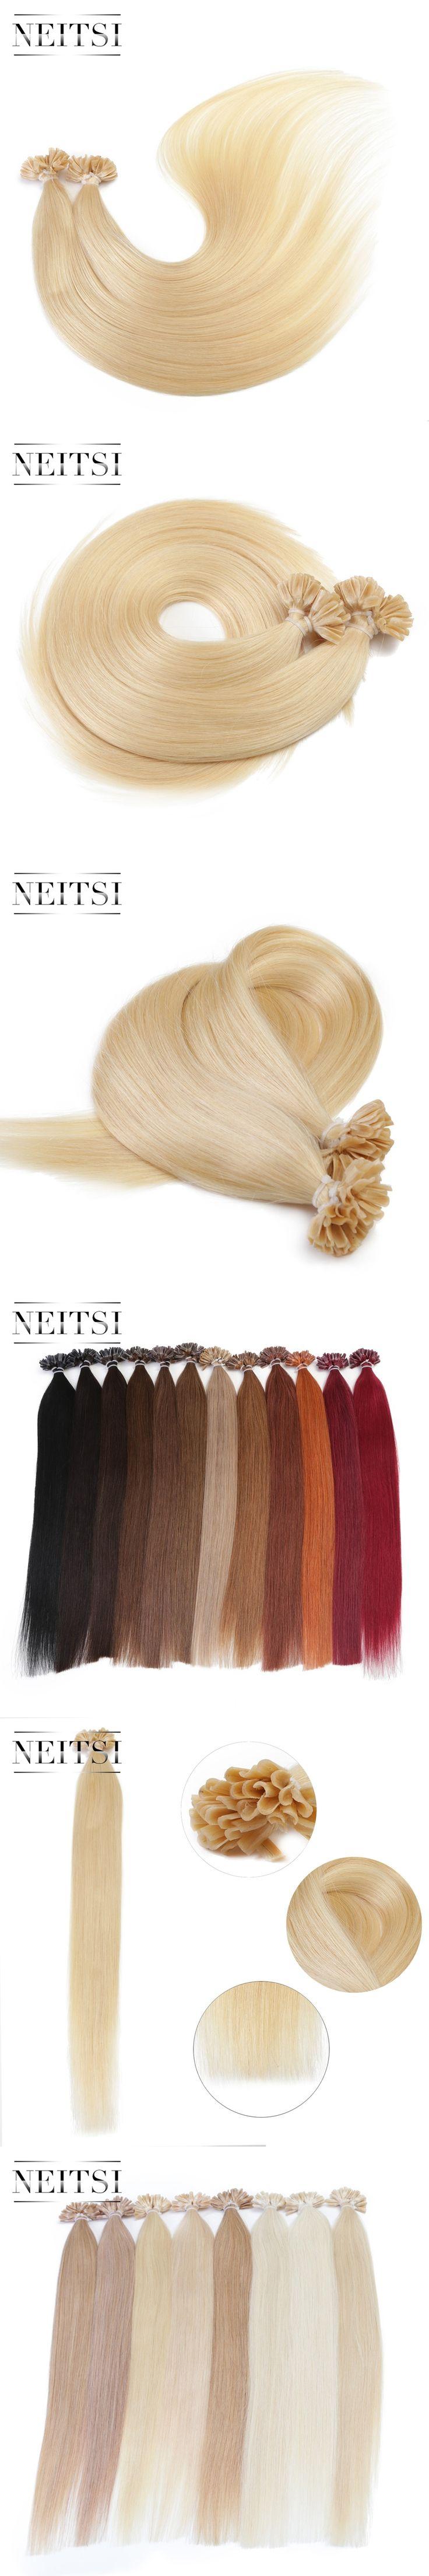 "Neitsi Straight Keratin Human Fusion Hair Nail U Tip Machine Made Remy Pre Bonded Hair Extension 16"" 20"" 24"" 1g/s Muti-Colors"